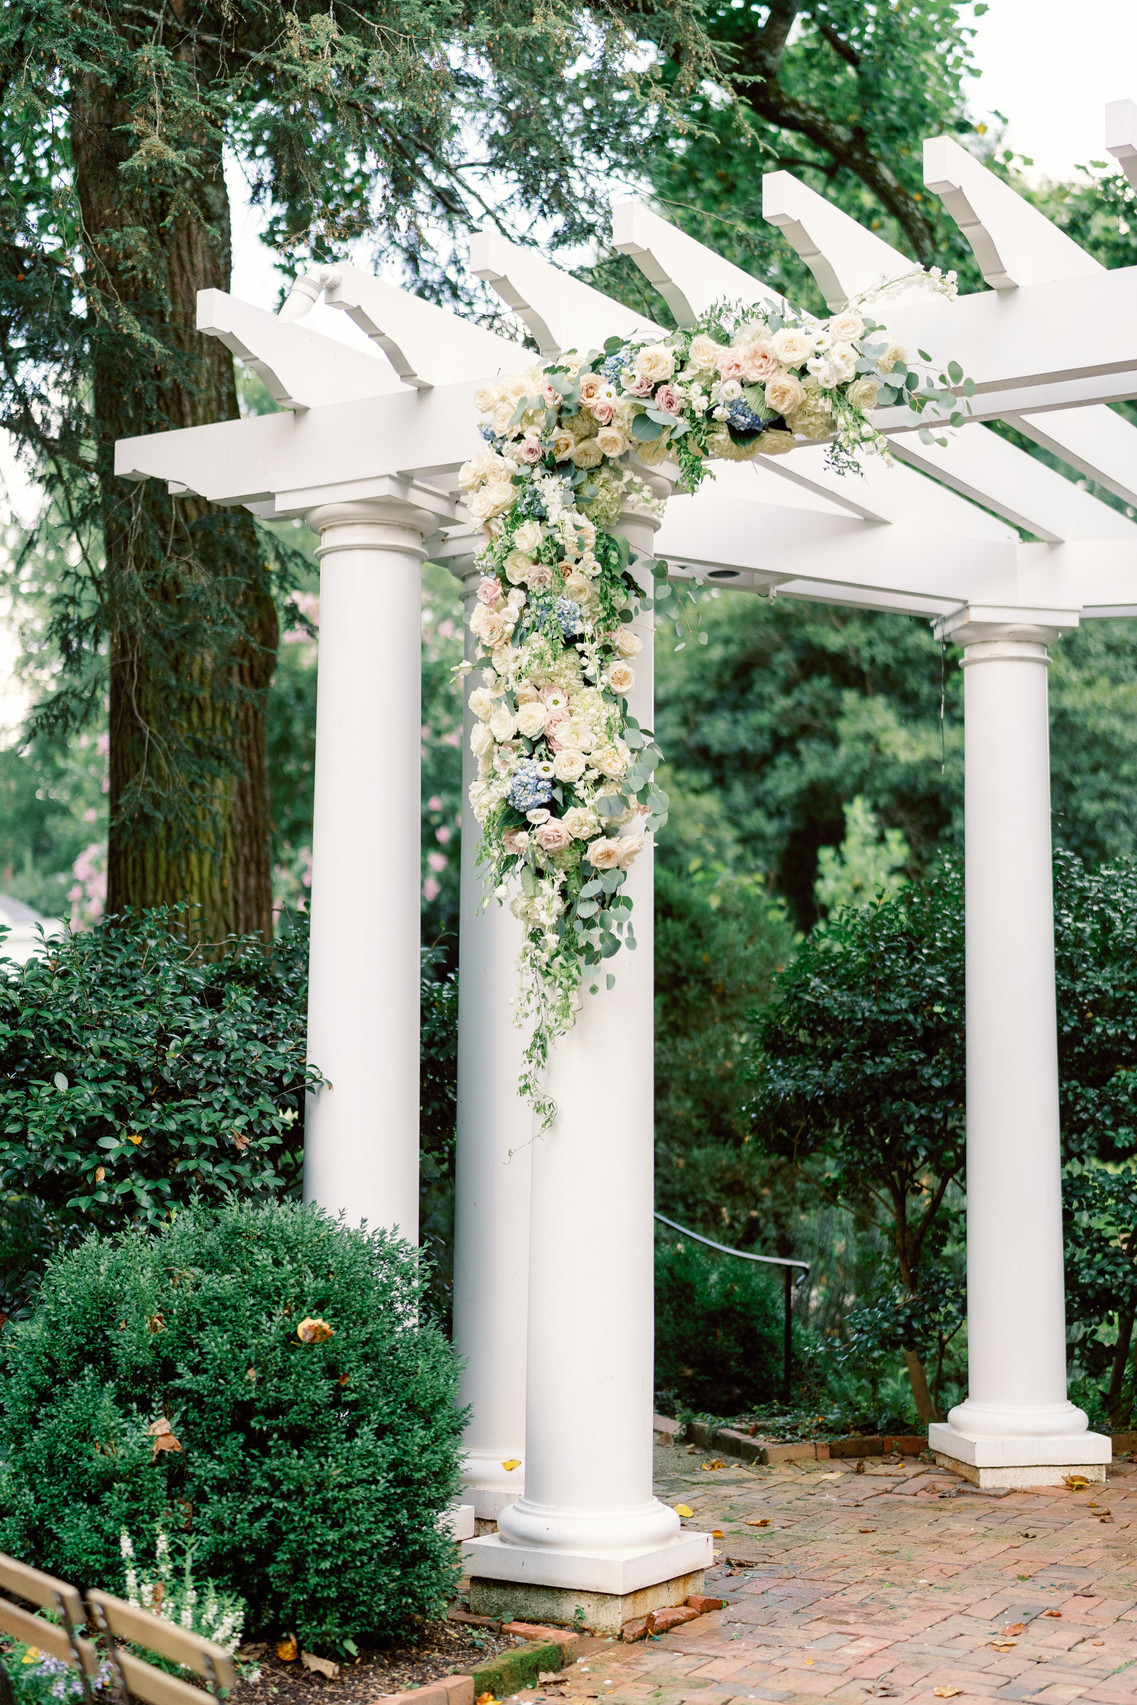 SoHo Event Design wedding planner Duke Mansion wedding ceremony